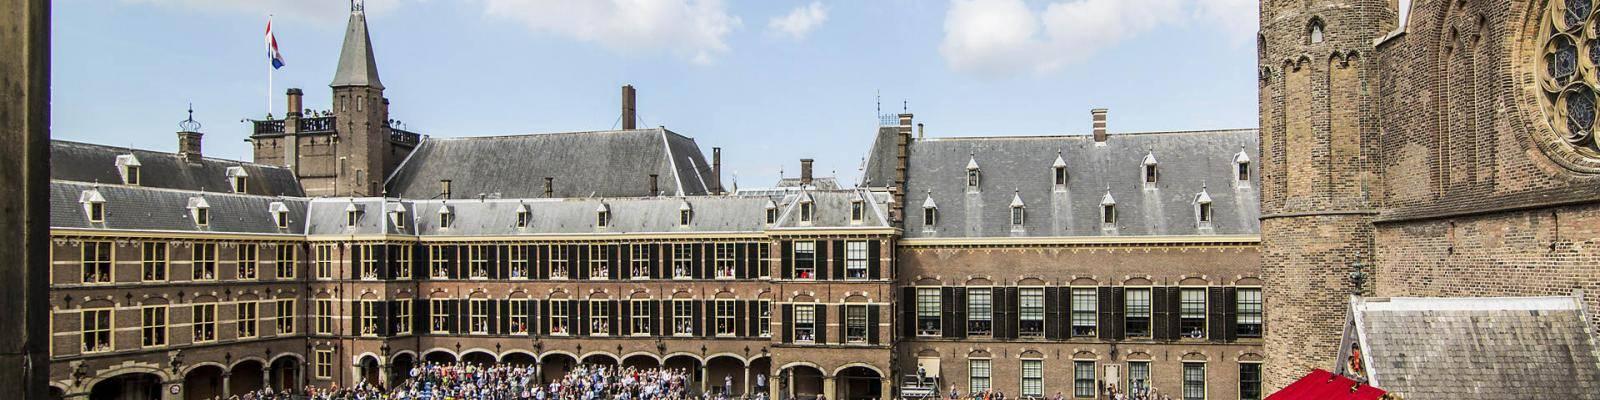 Prinsjesdag Den Haag Binnenhof